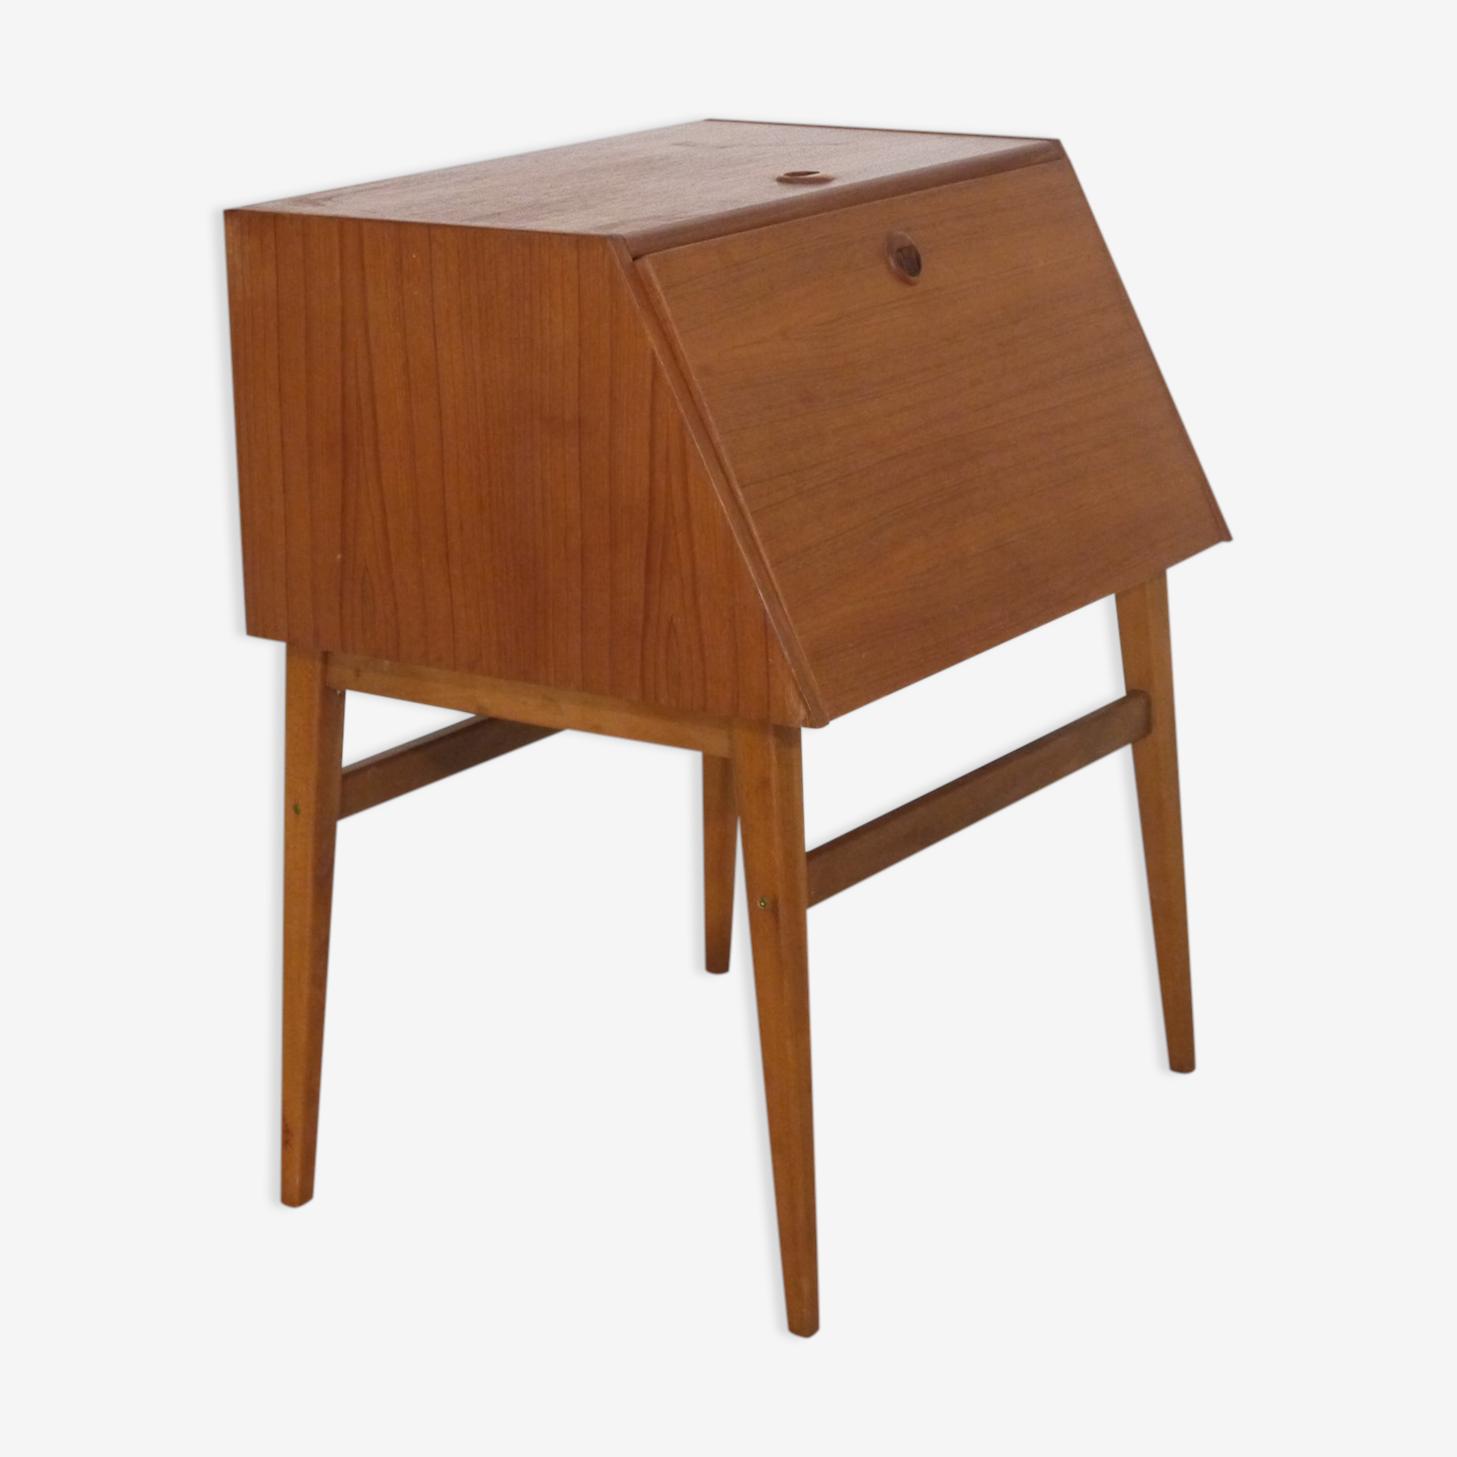 Occasional furniture, storage vintage teak